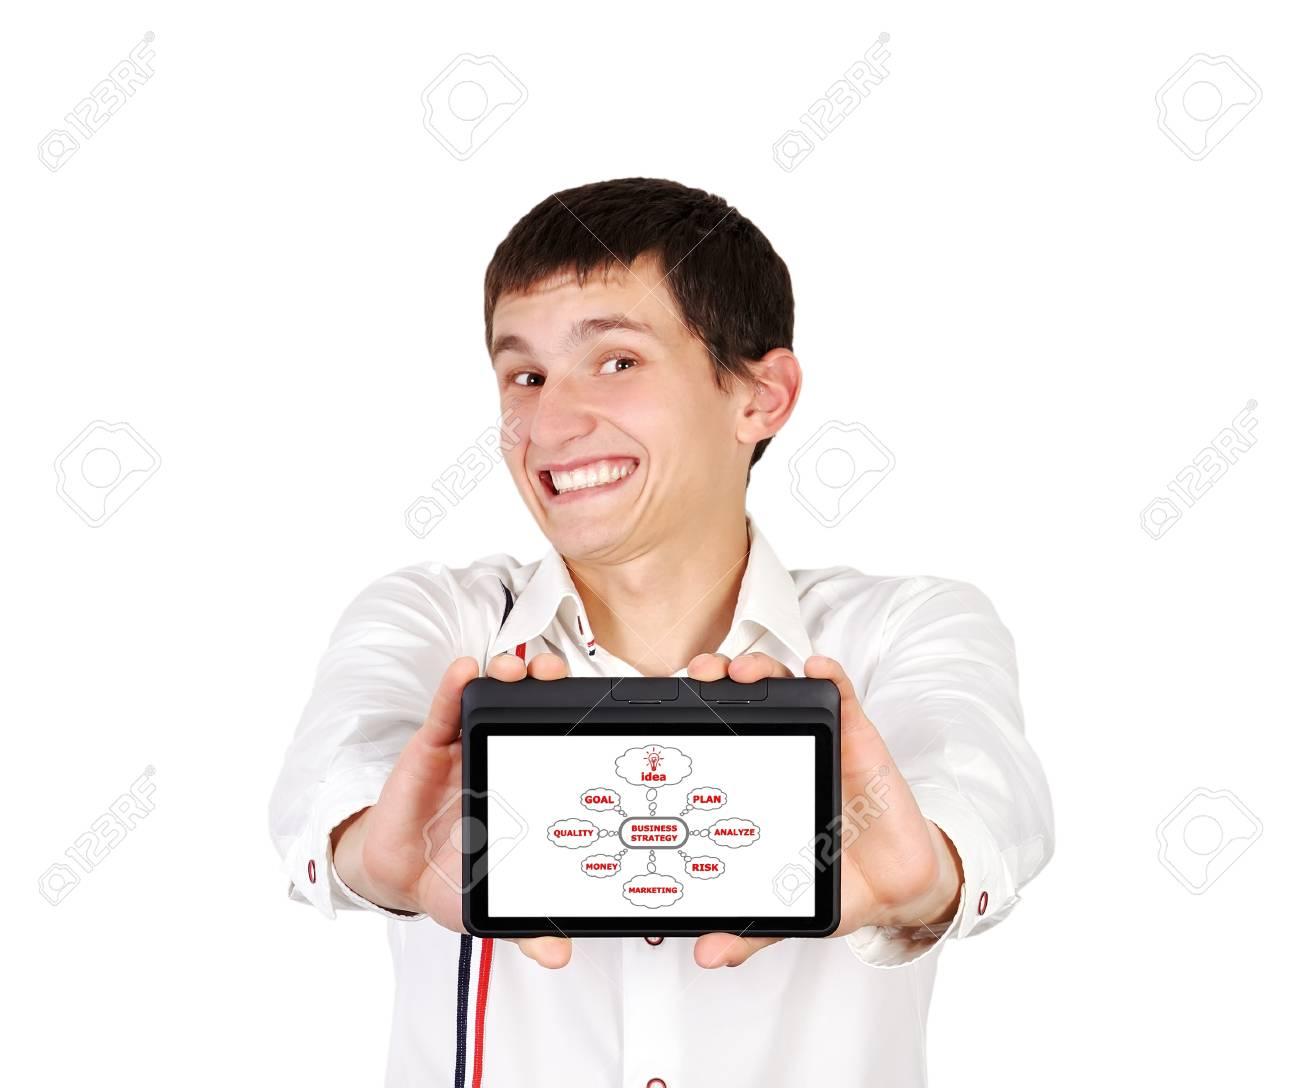 scheme business strategy on digital tablet Stock Photo - 15977464